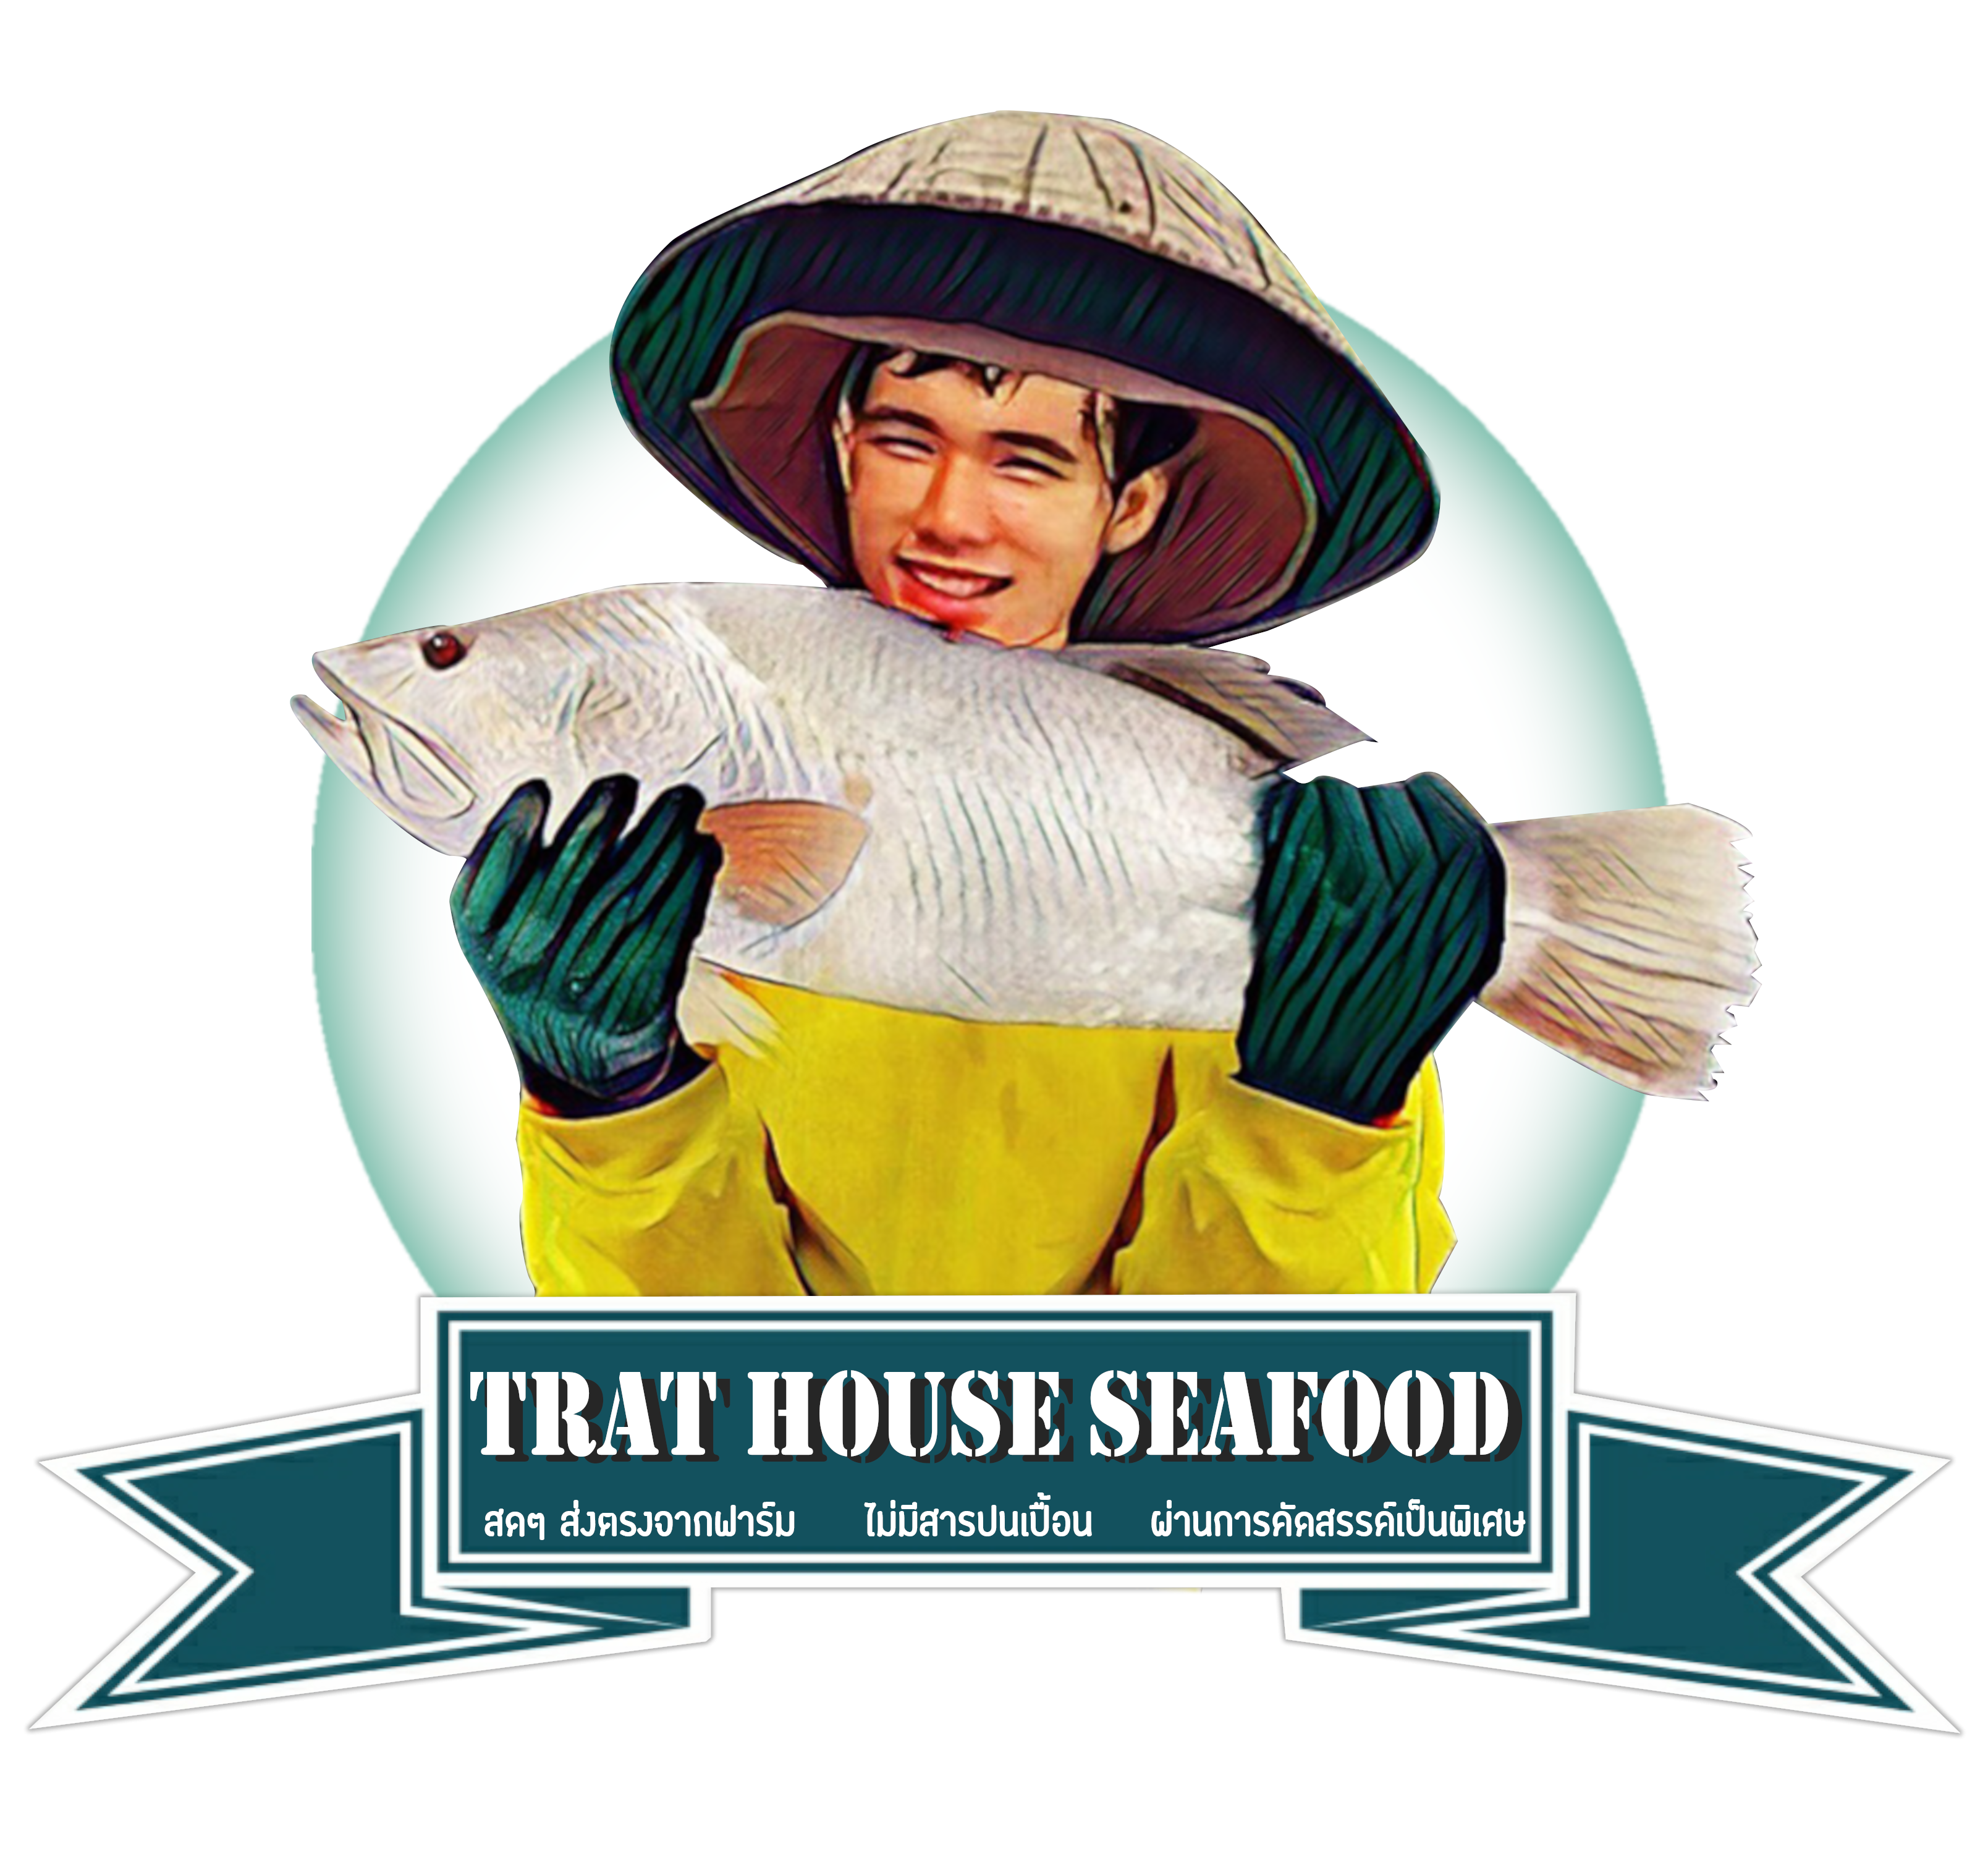 trathouseseafood